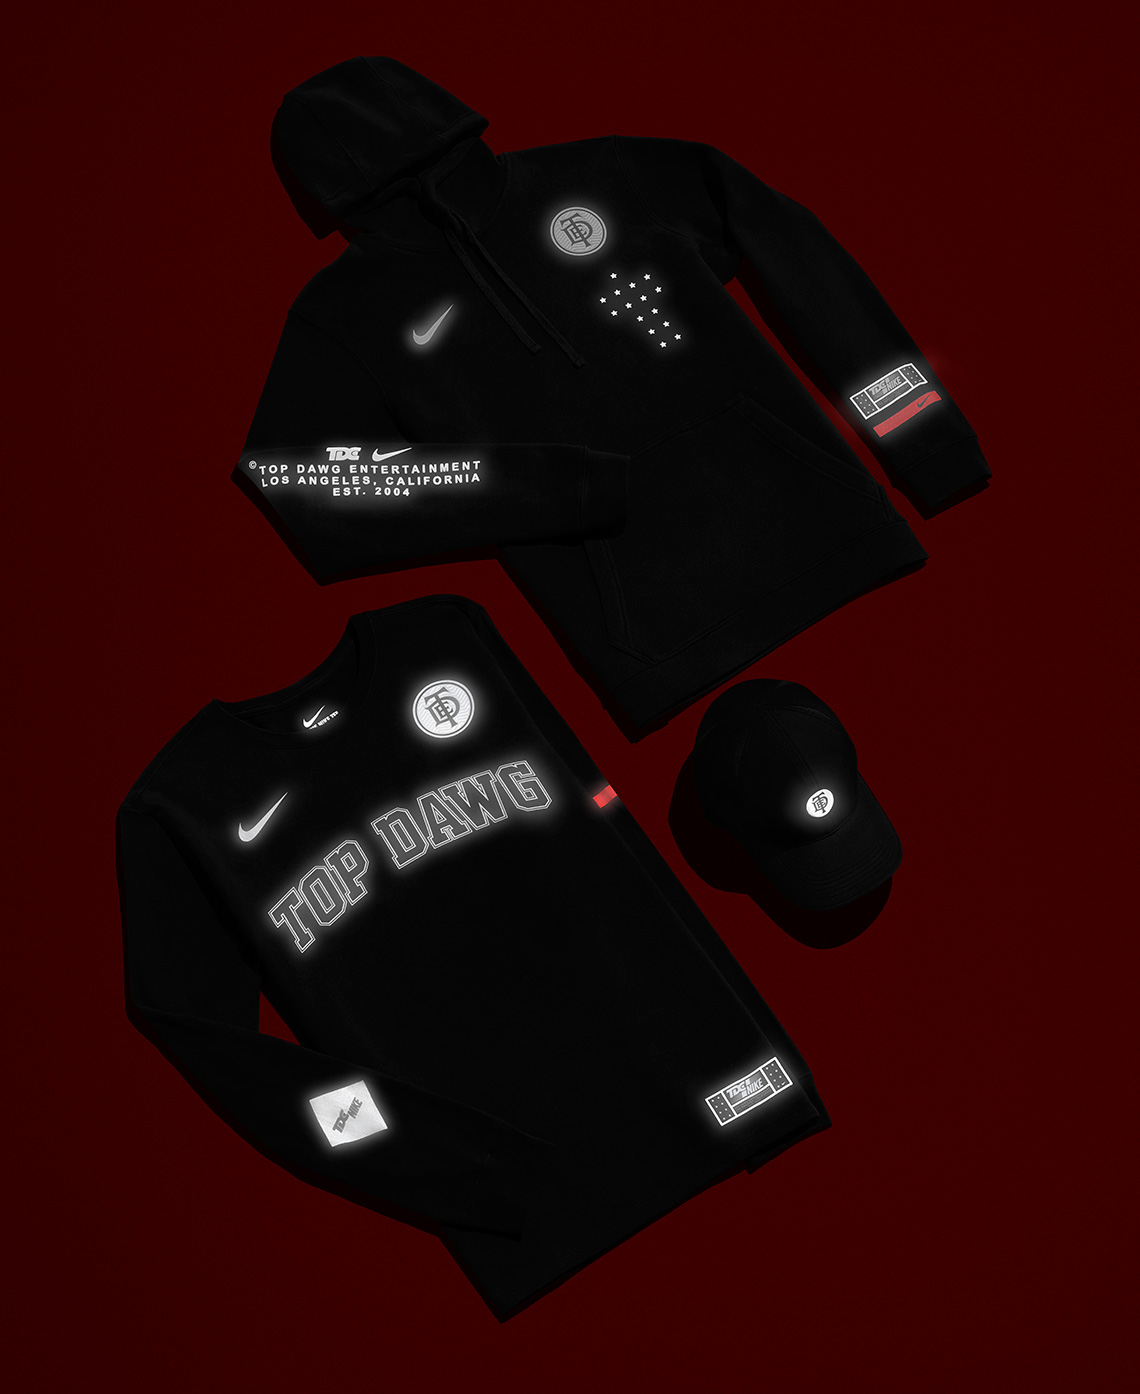 b798e3fd Where To Buy Nike Kendrick Lamar TDE The Championship Tour Merch ...